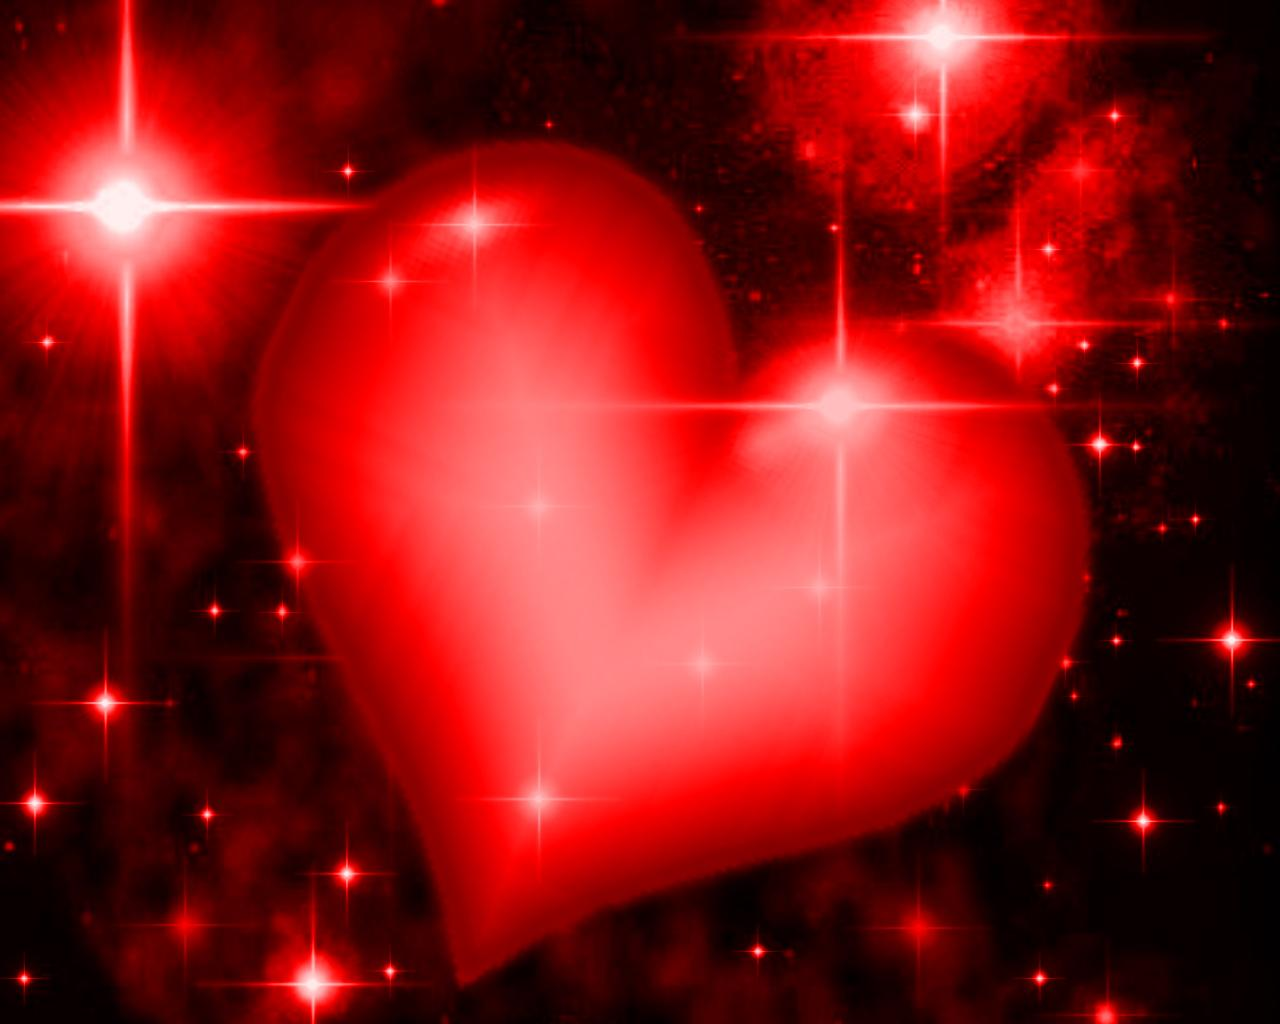 Hearts Red Love Hd Wallpaper Tokomo Pics 1280x1024